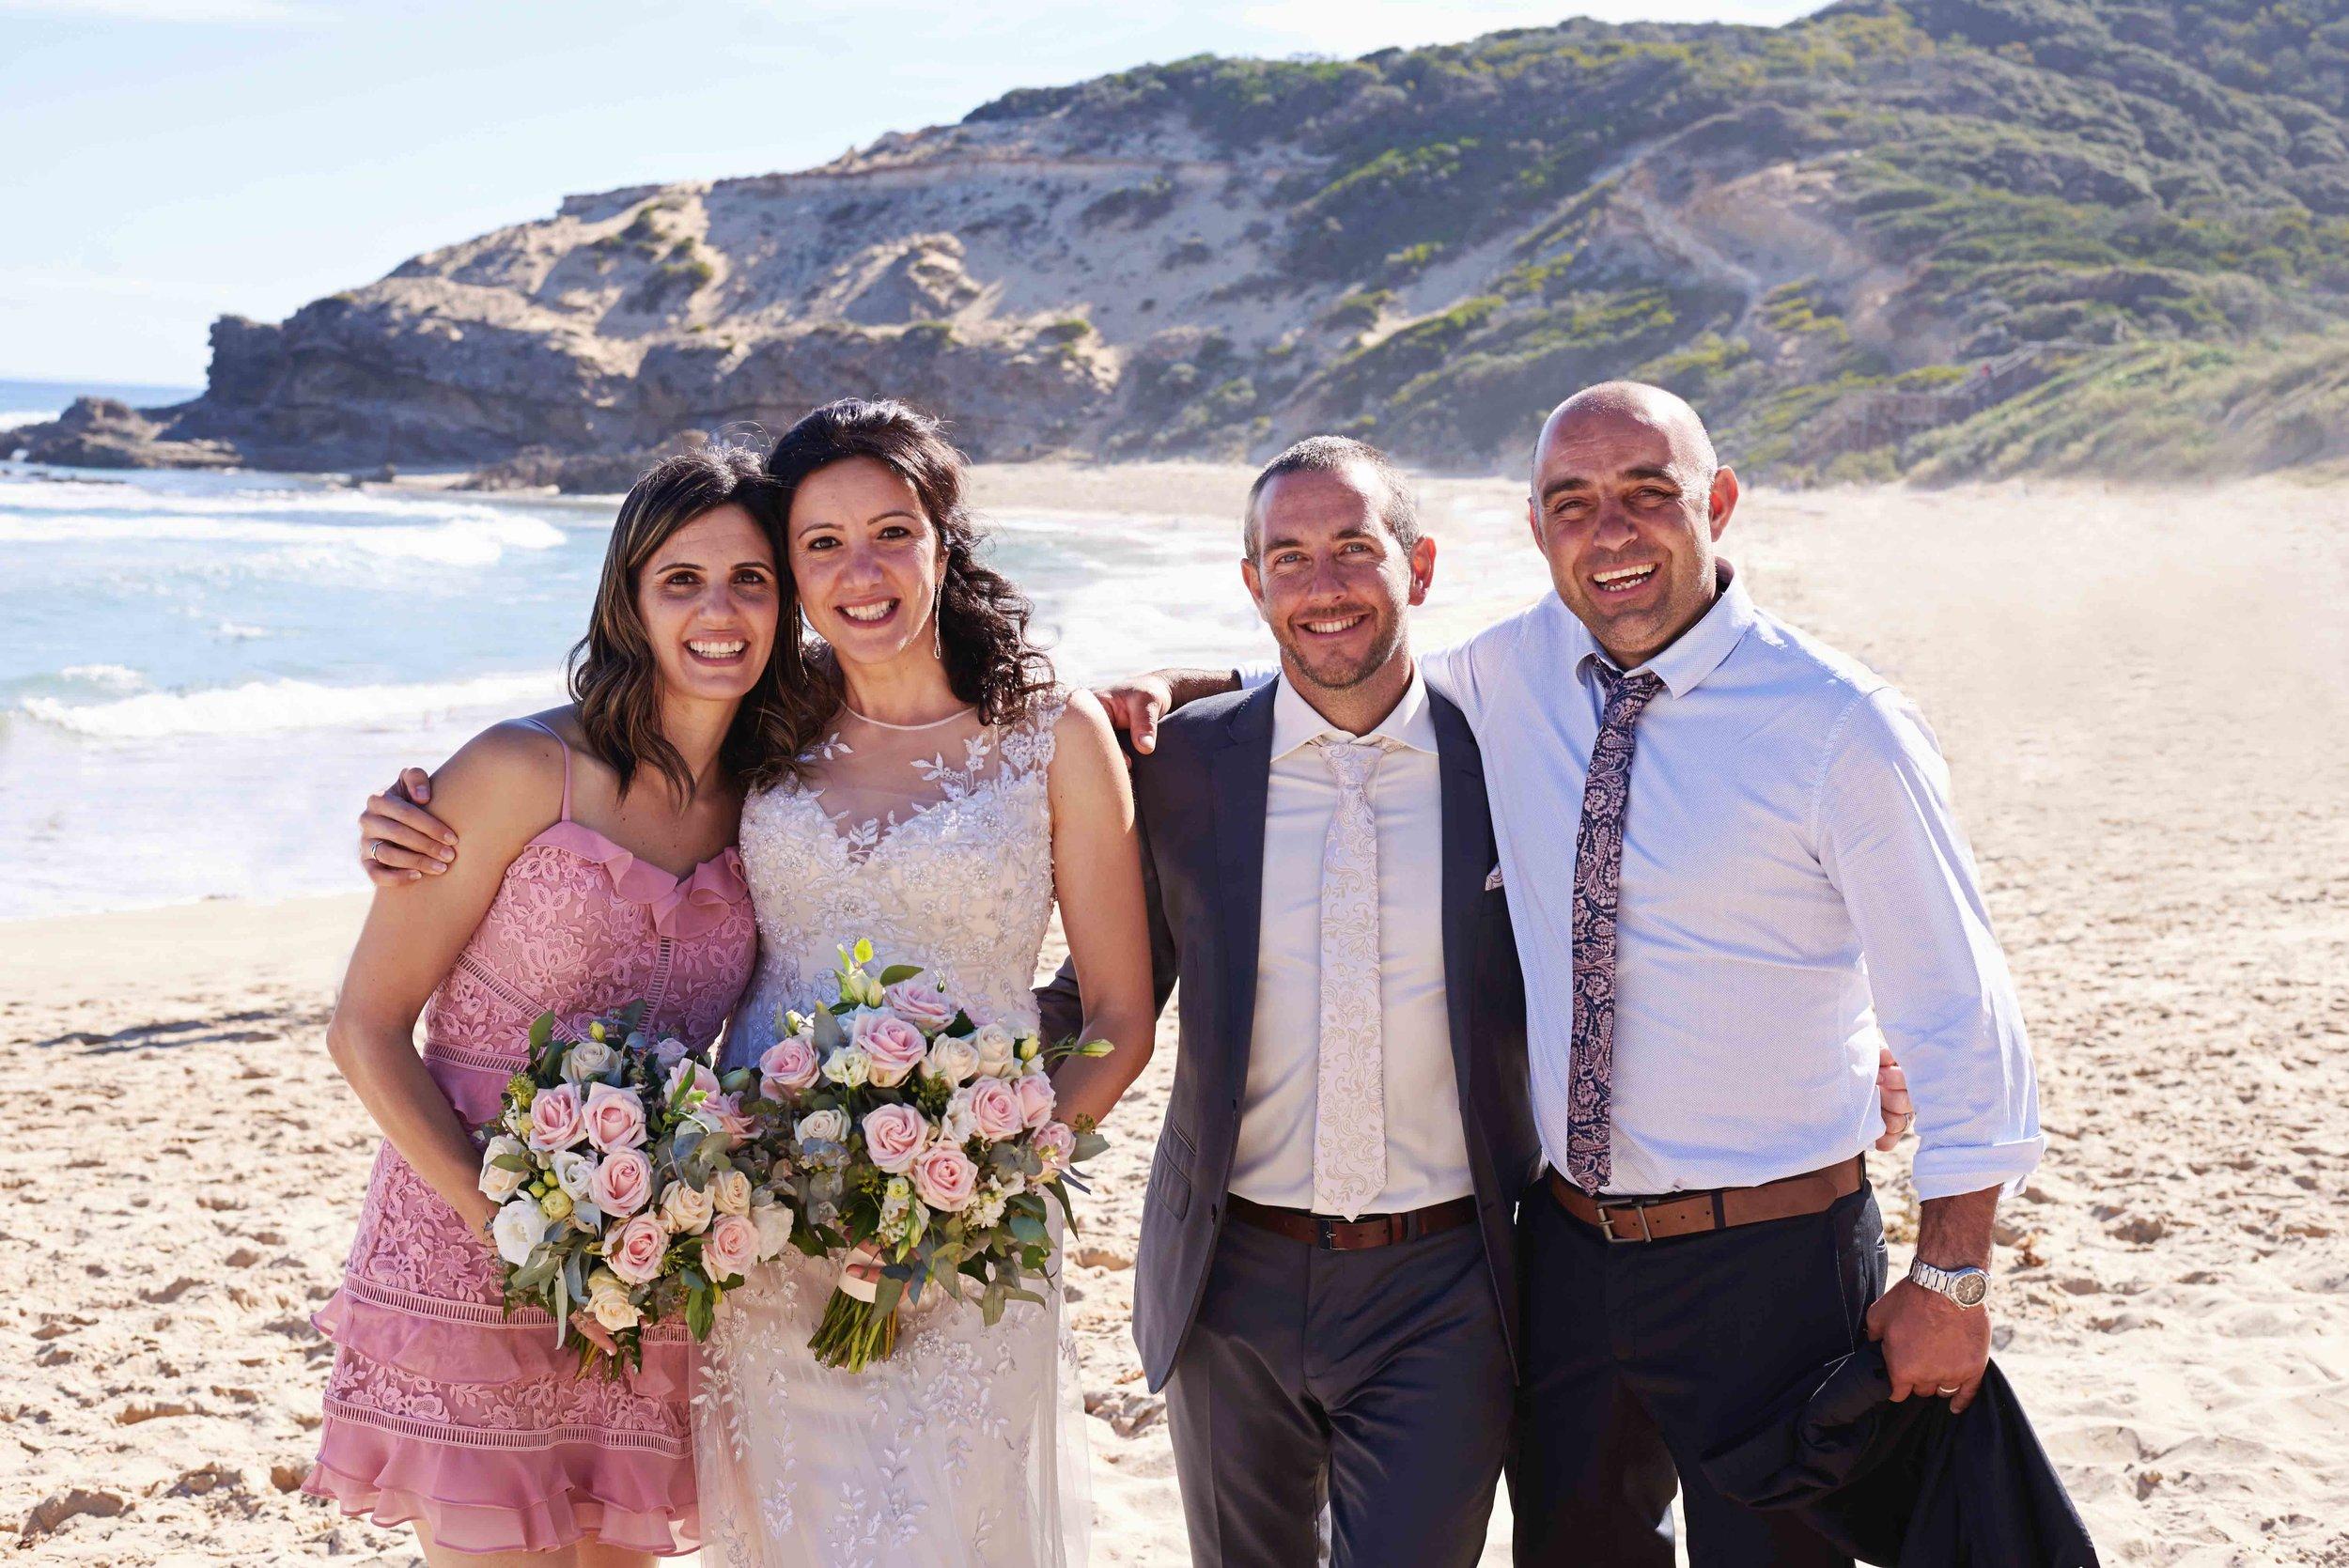 sorrento-wedding-photography-all-smiles-marissa-jade-photography-121.jpg